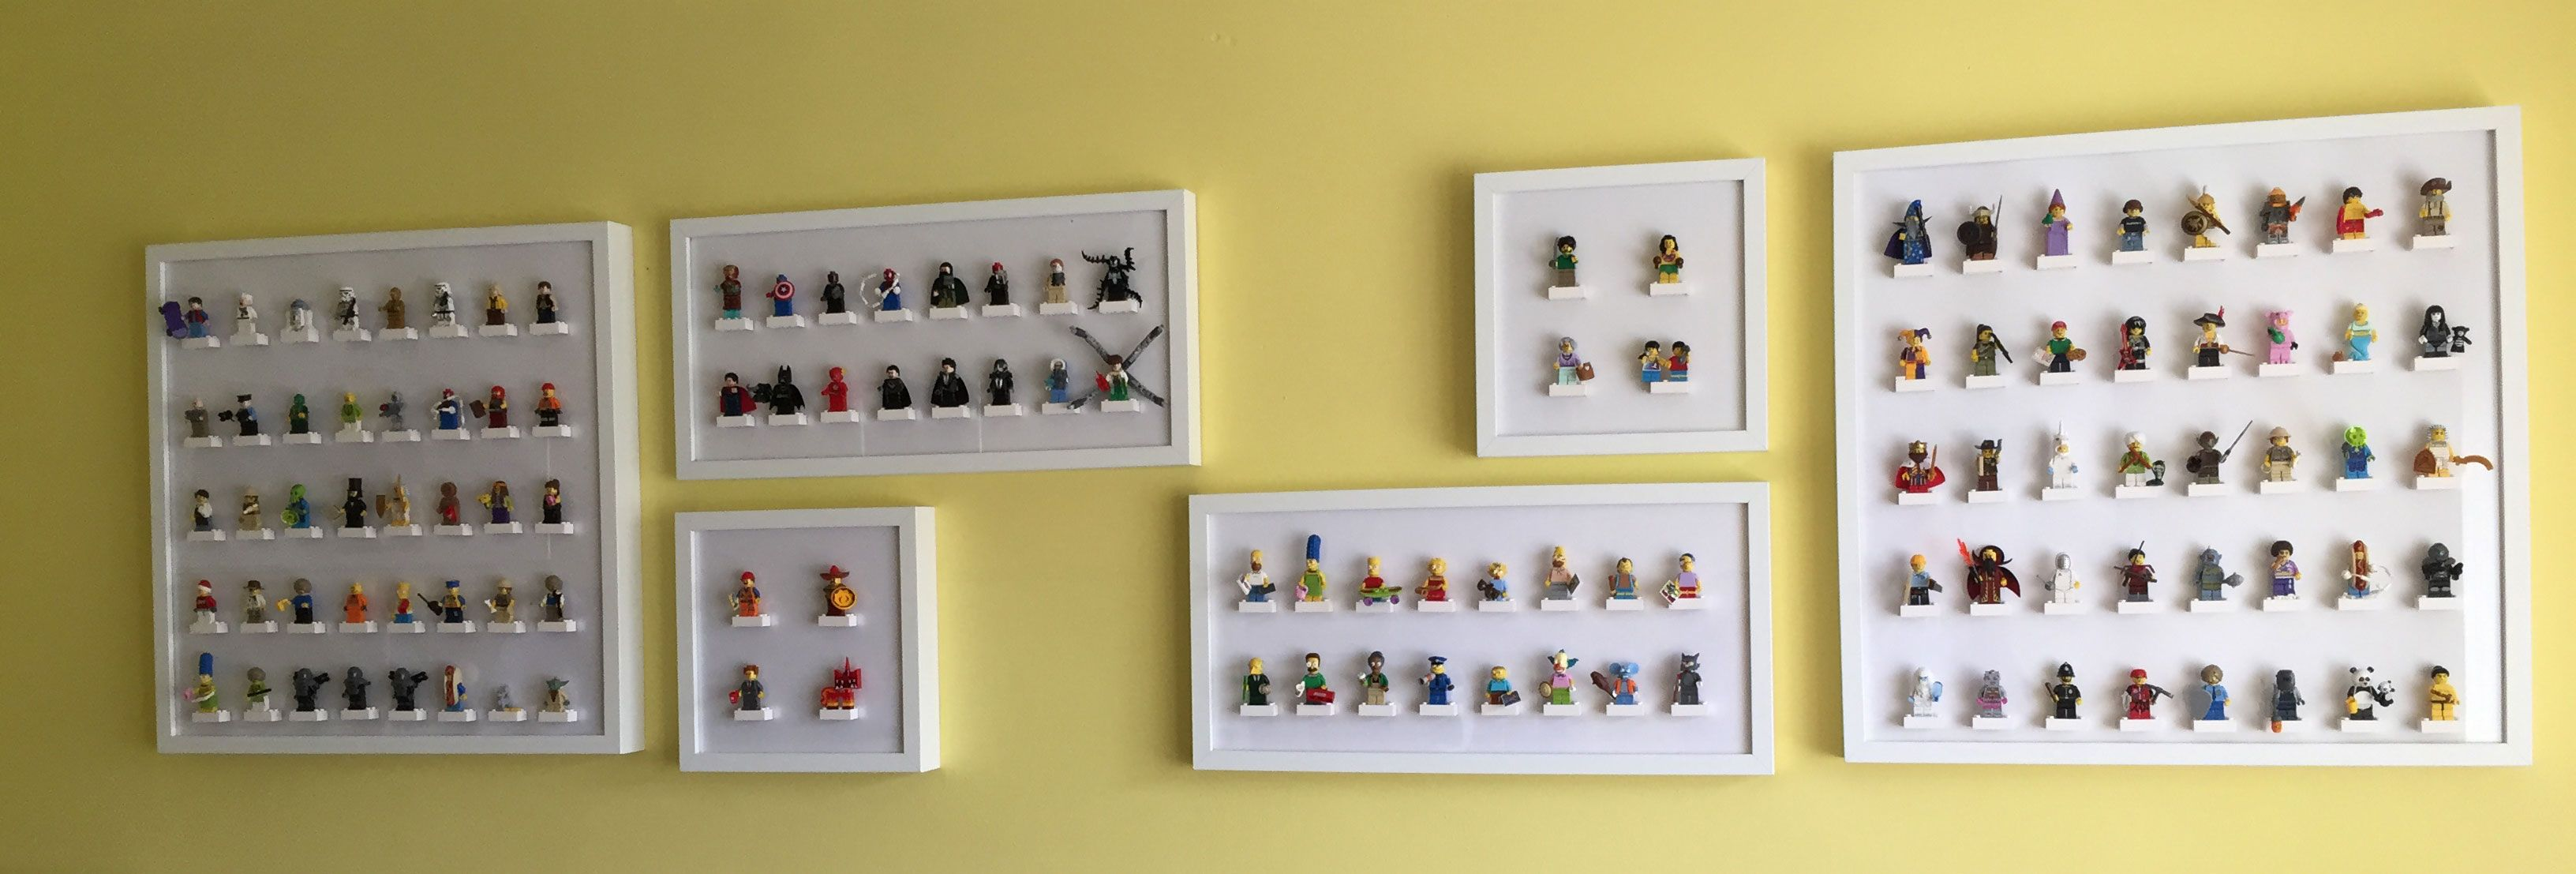 Magnificent Lego Ribba Frame Motif - Frame Photo Design Ideas ...